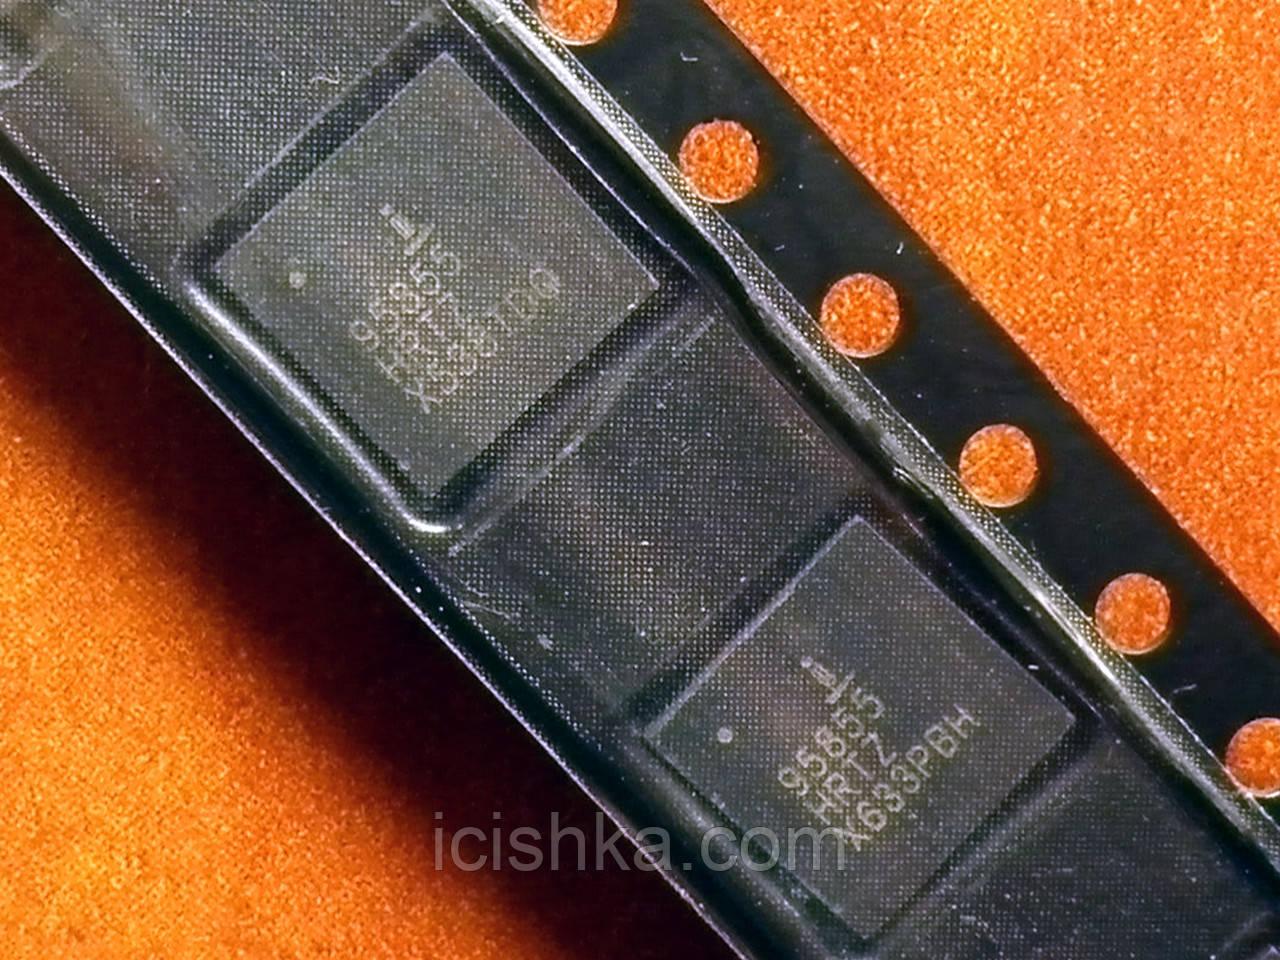 ISL95855 / ISL95855HRTZ - контроллер питания IMVP